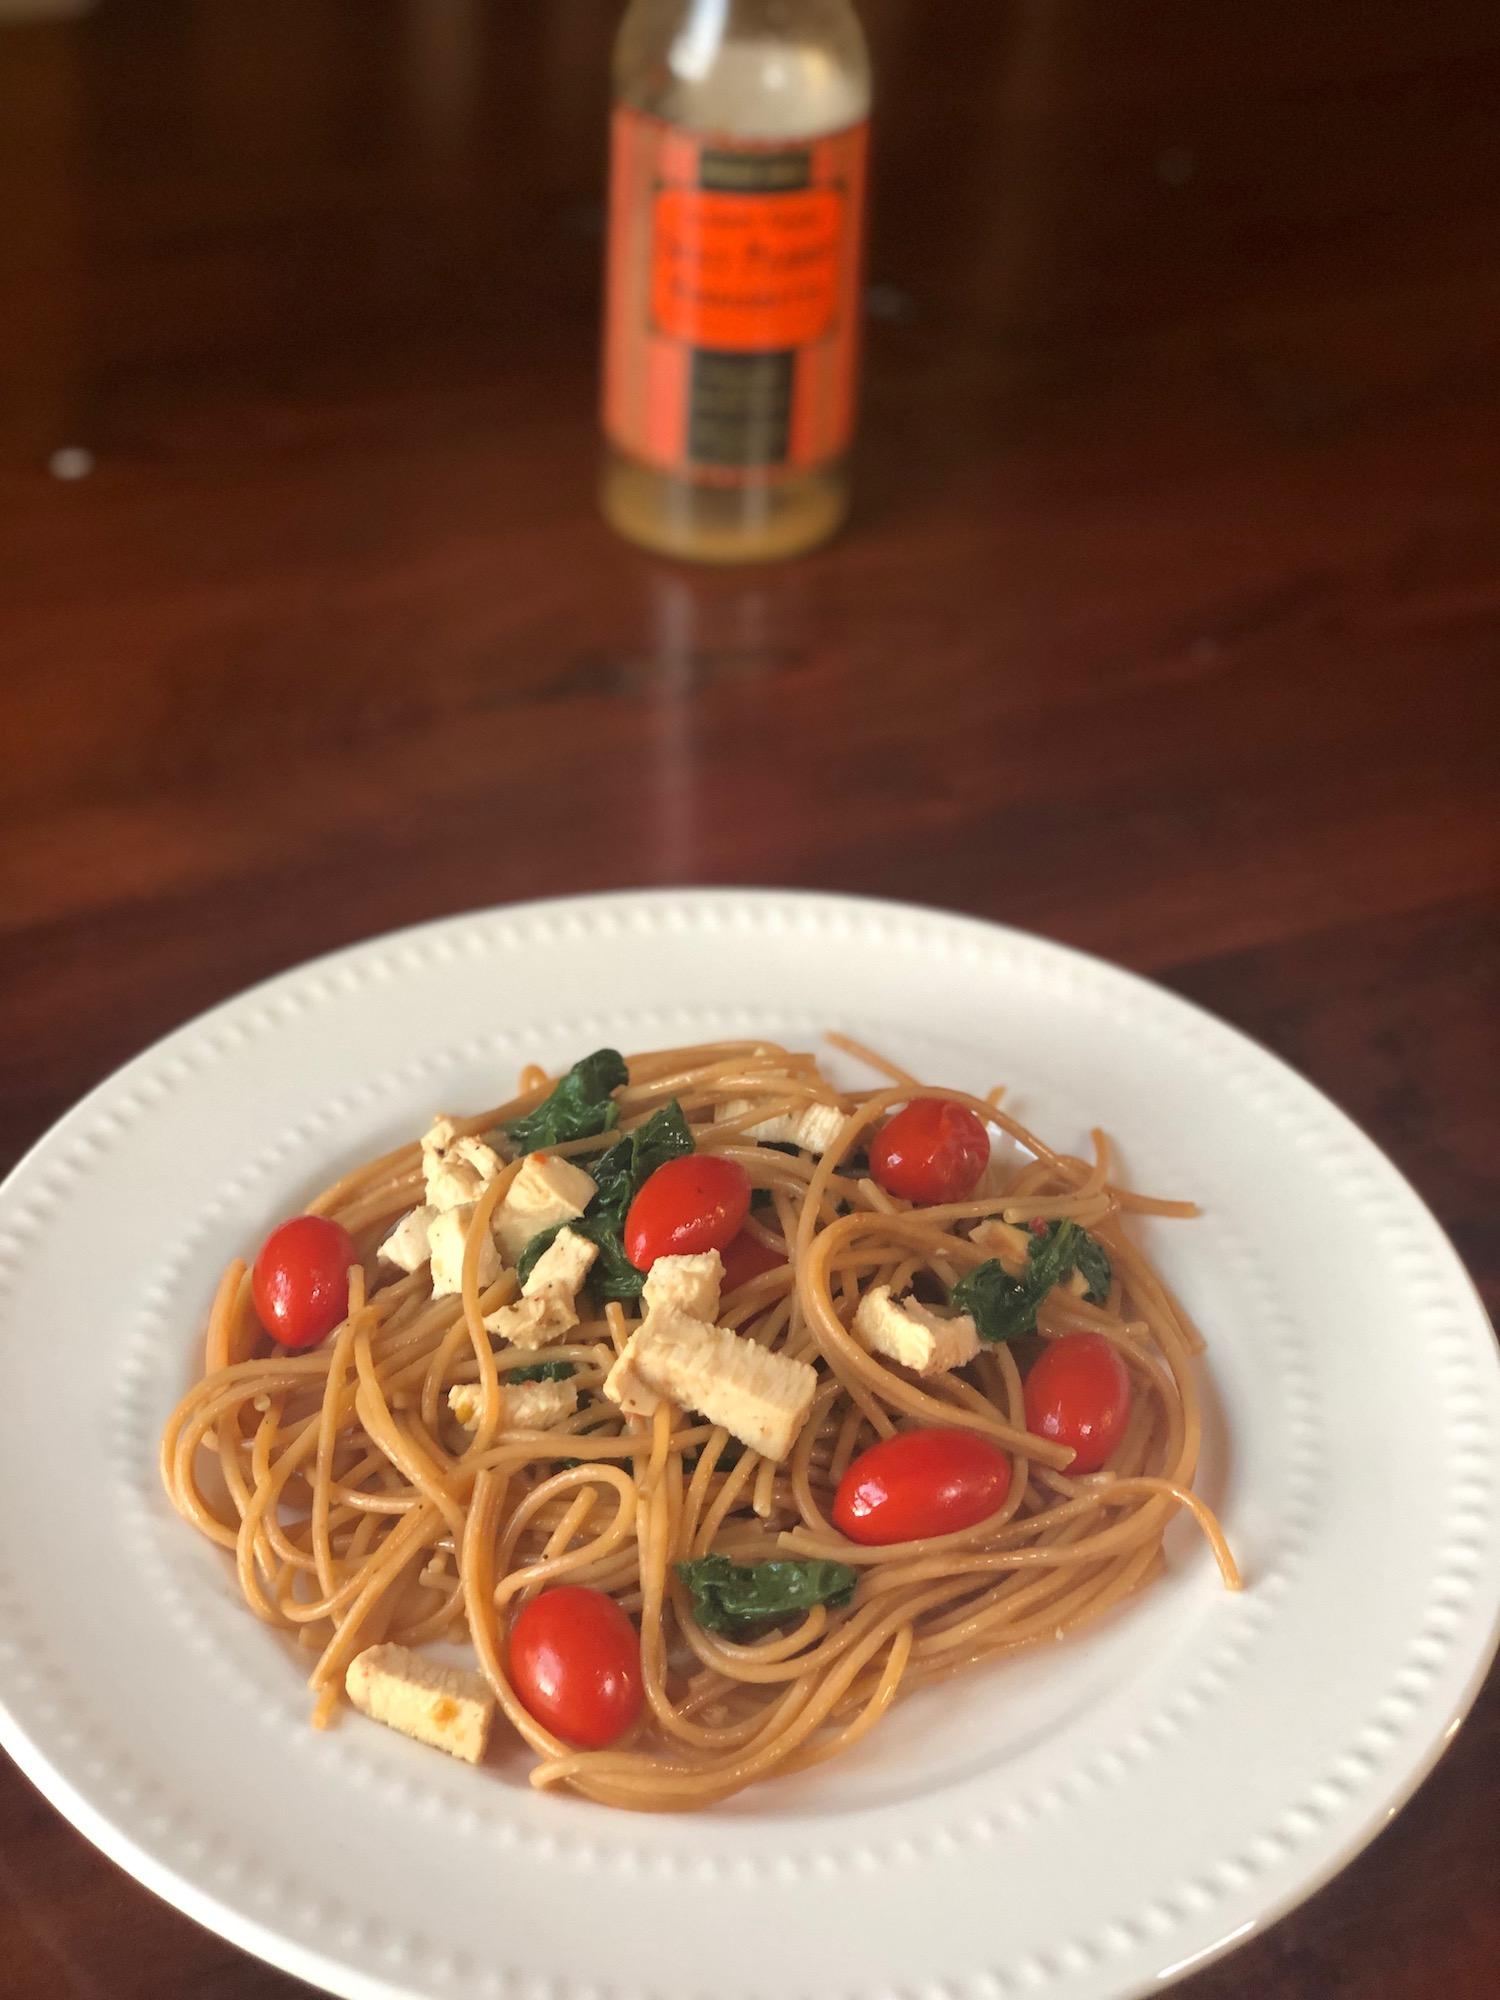 AAY Nutrition Trader Joes Spicy Chicken Pasta Dinner Recipe